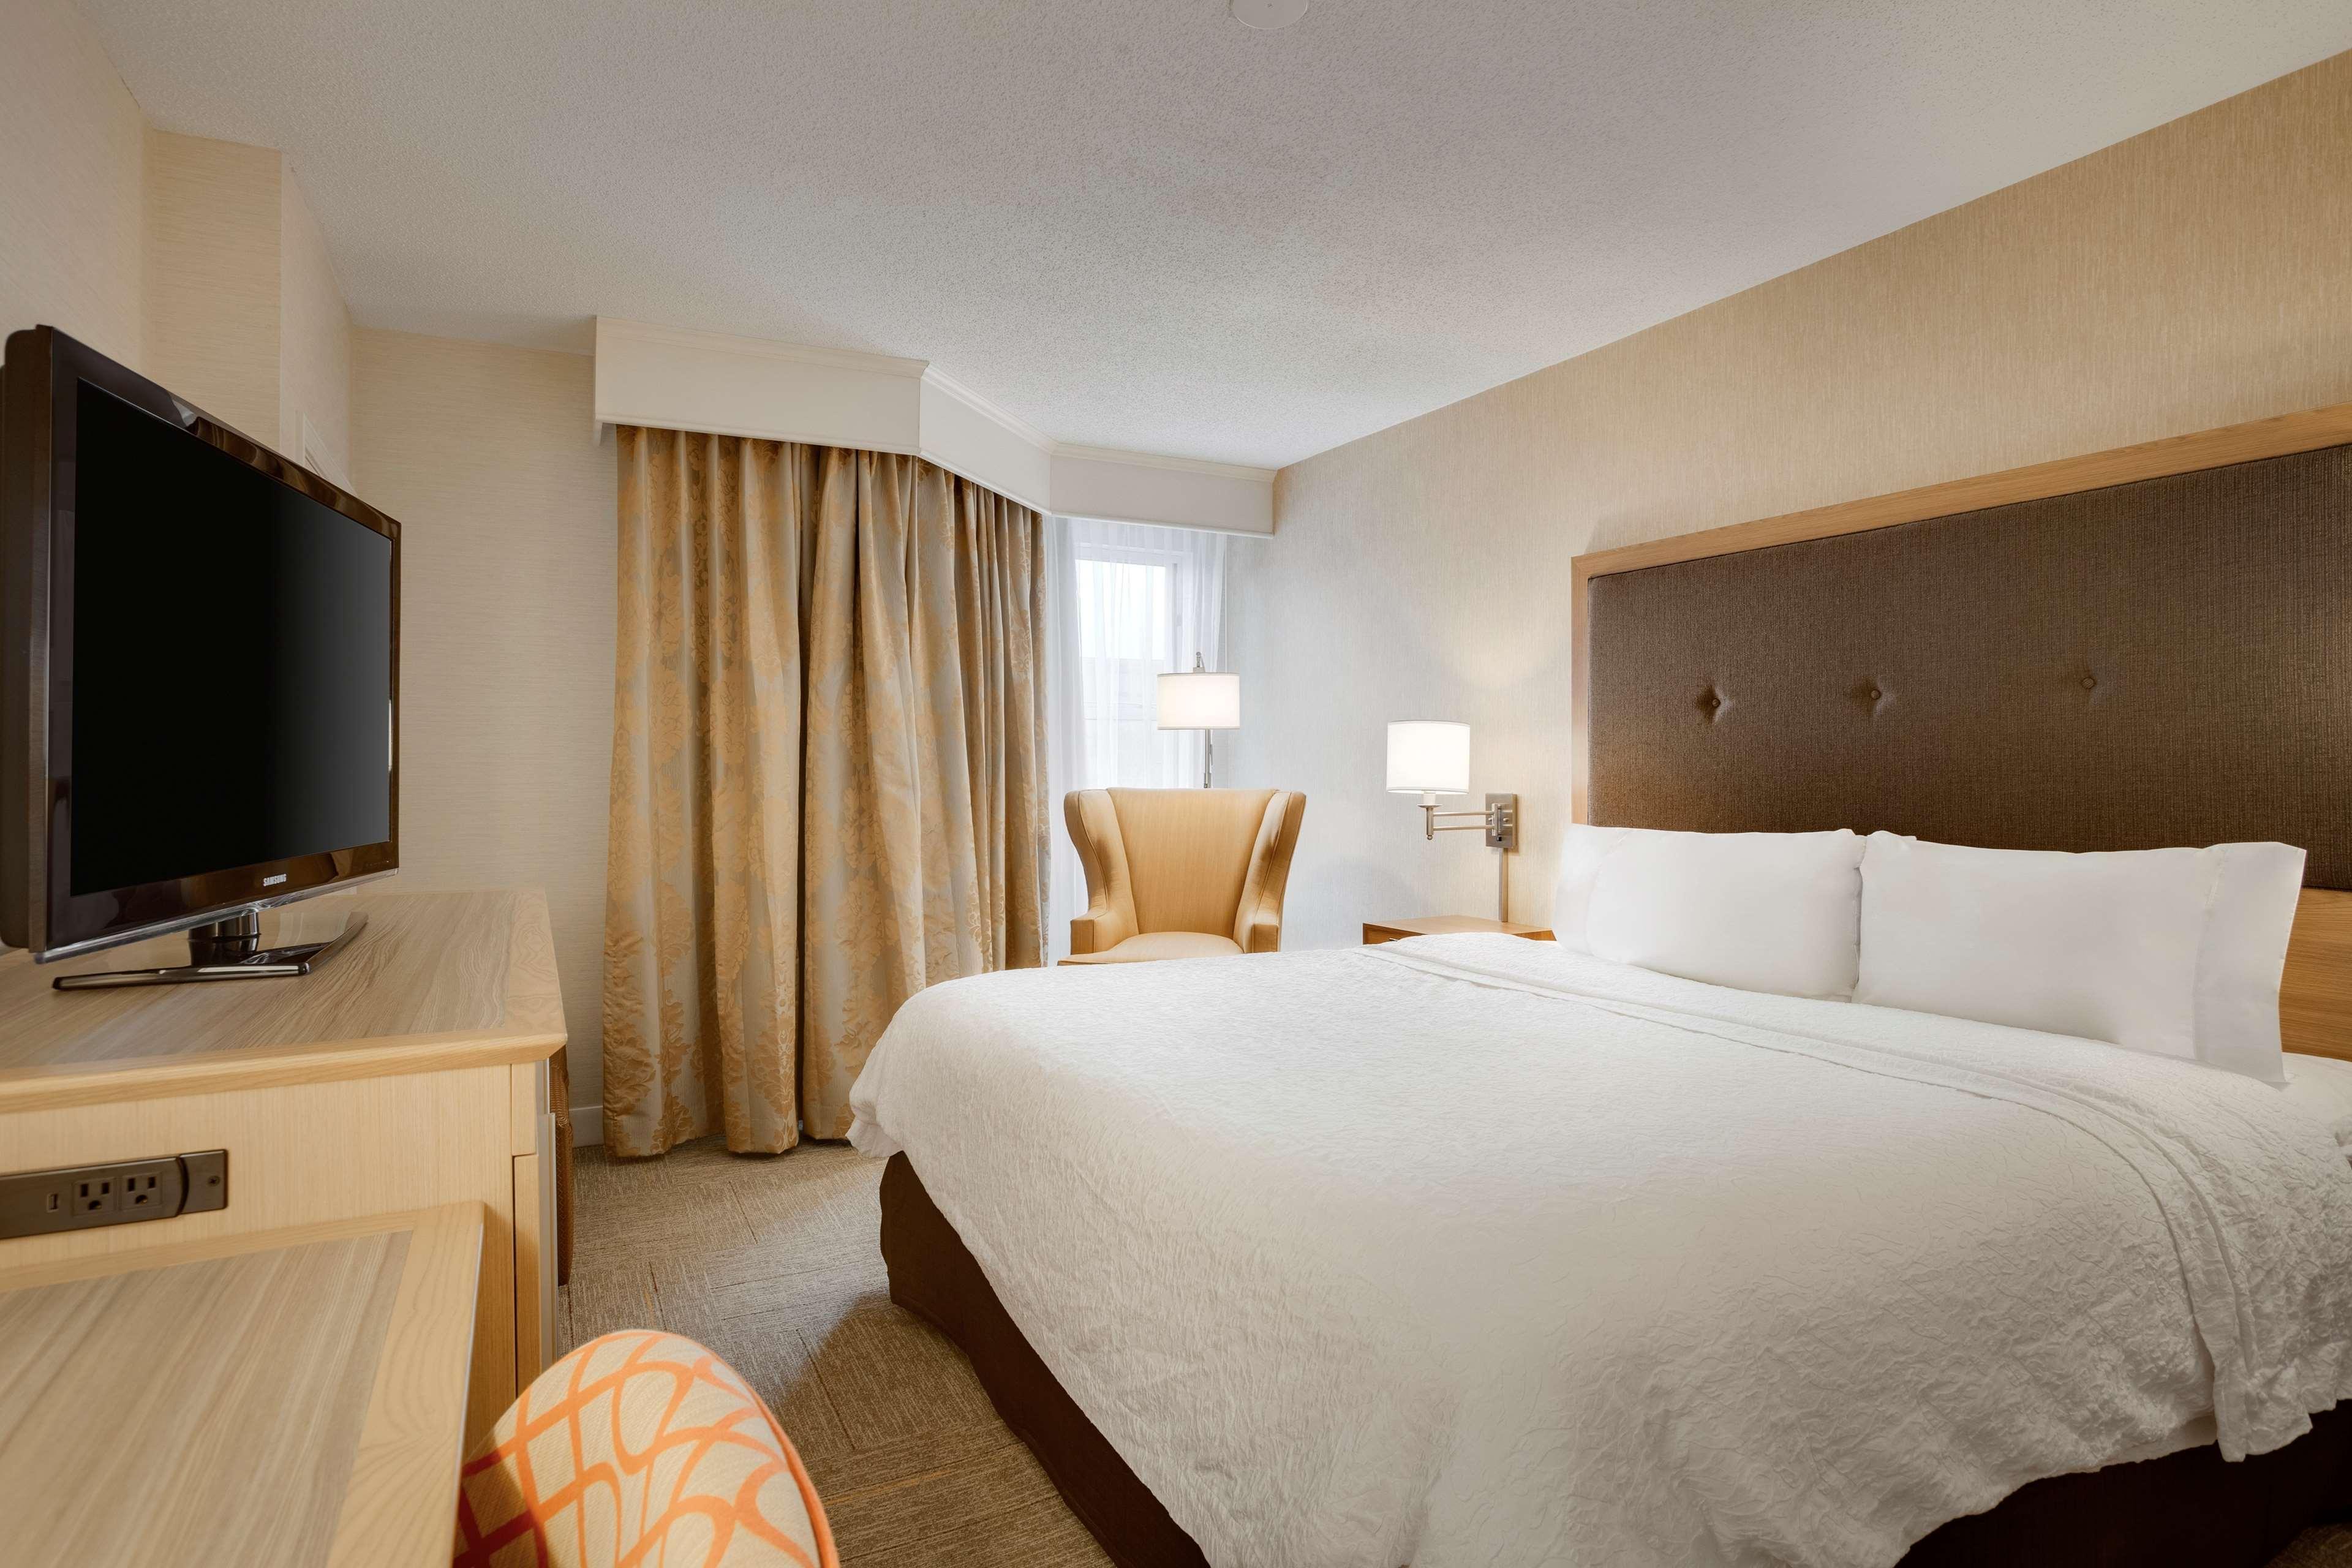 Hampton Inn & Suites Cleveland/Independence image 18